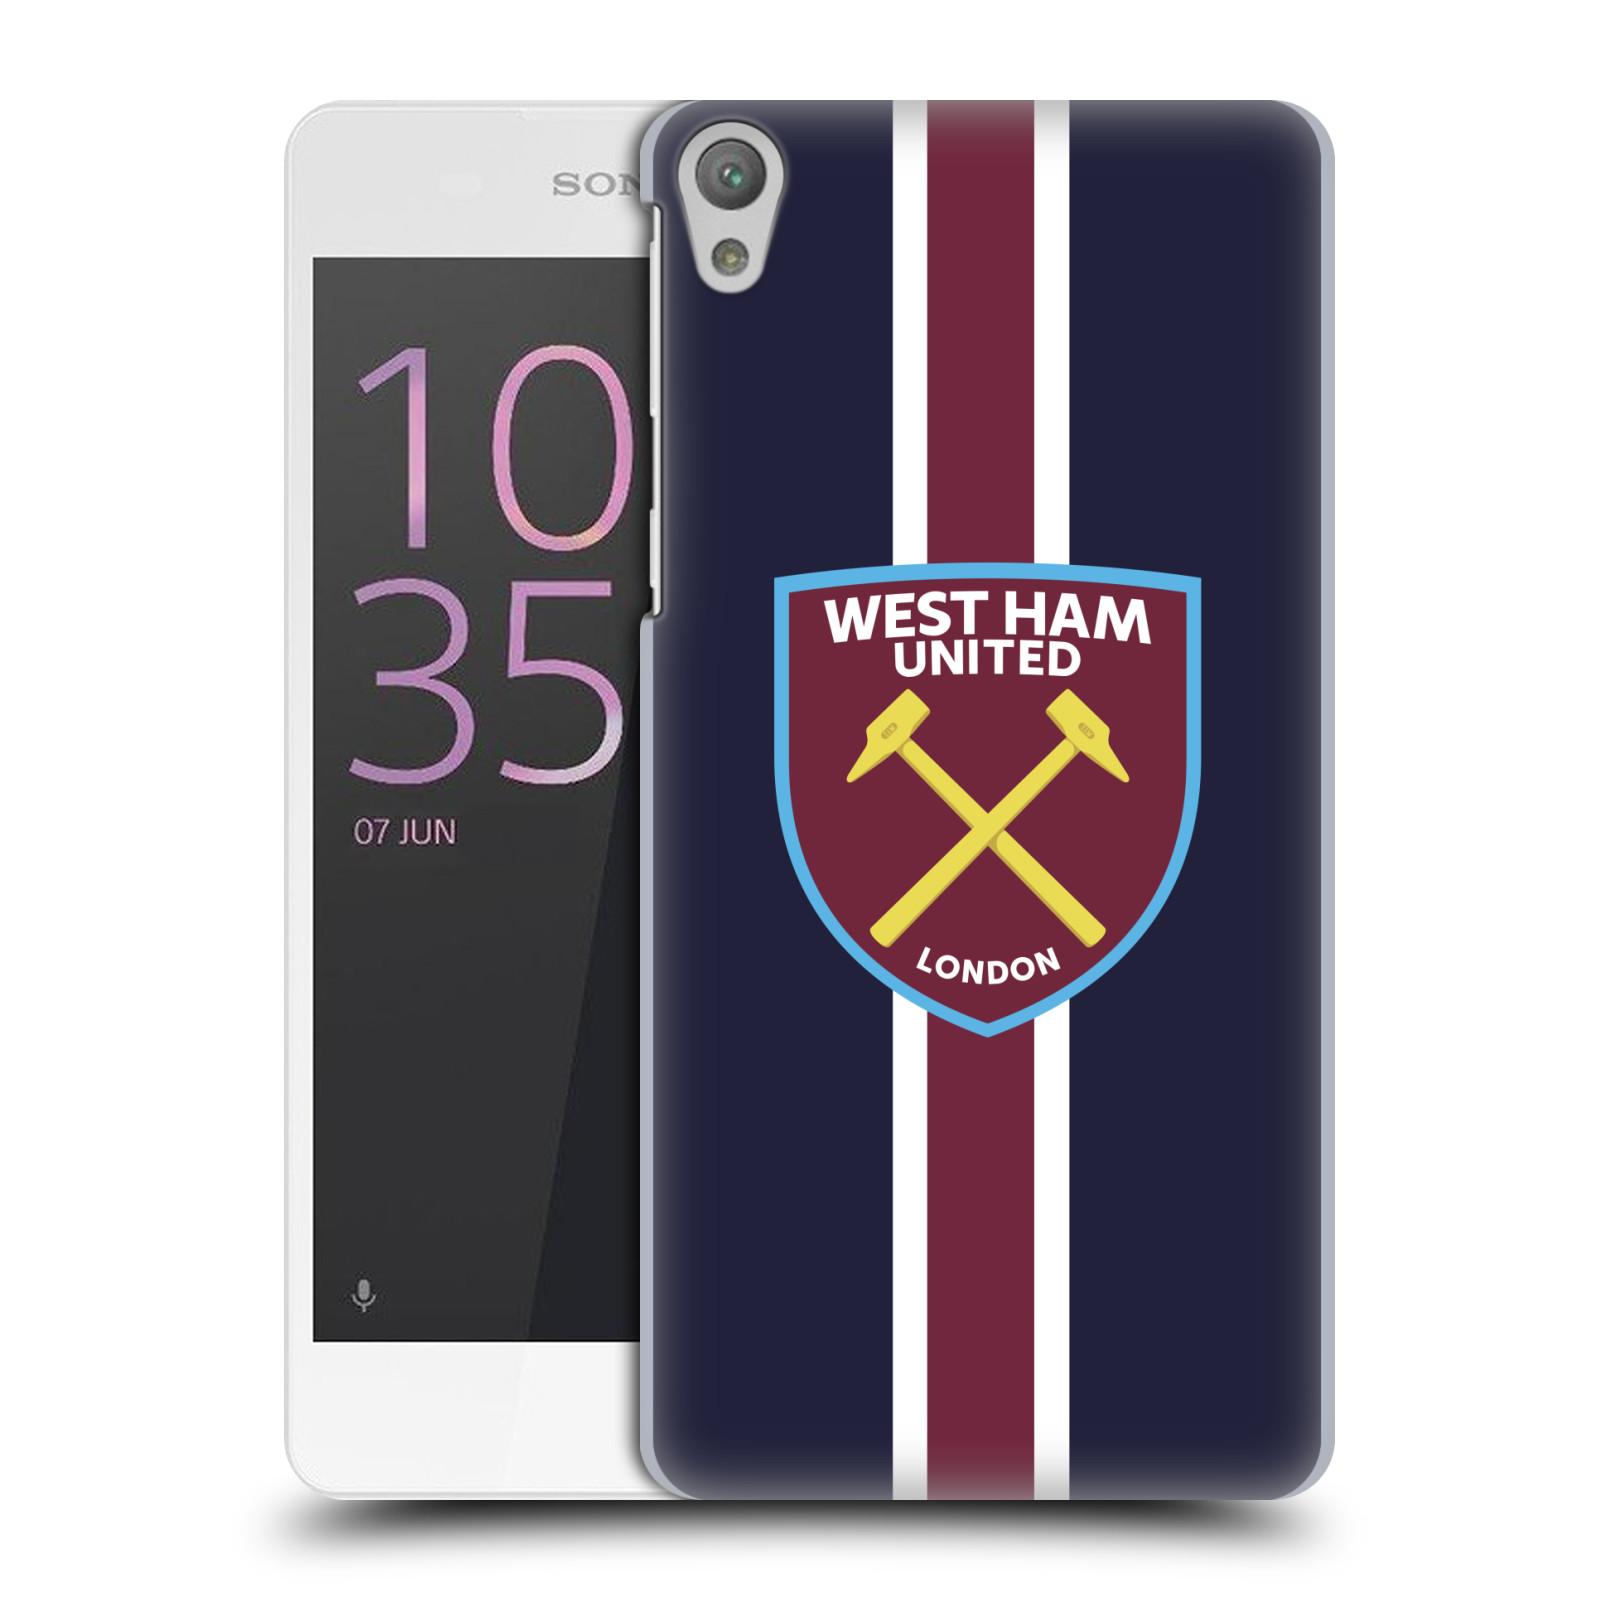 Plastové pouzdro na mobil Sony Xperia E5 - Head Case - West Ham United - Pruhy